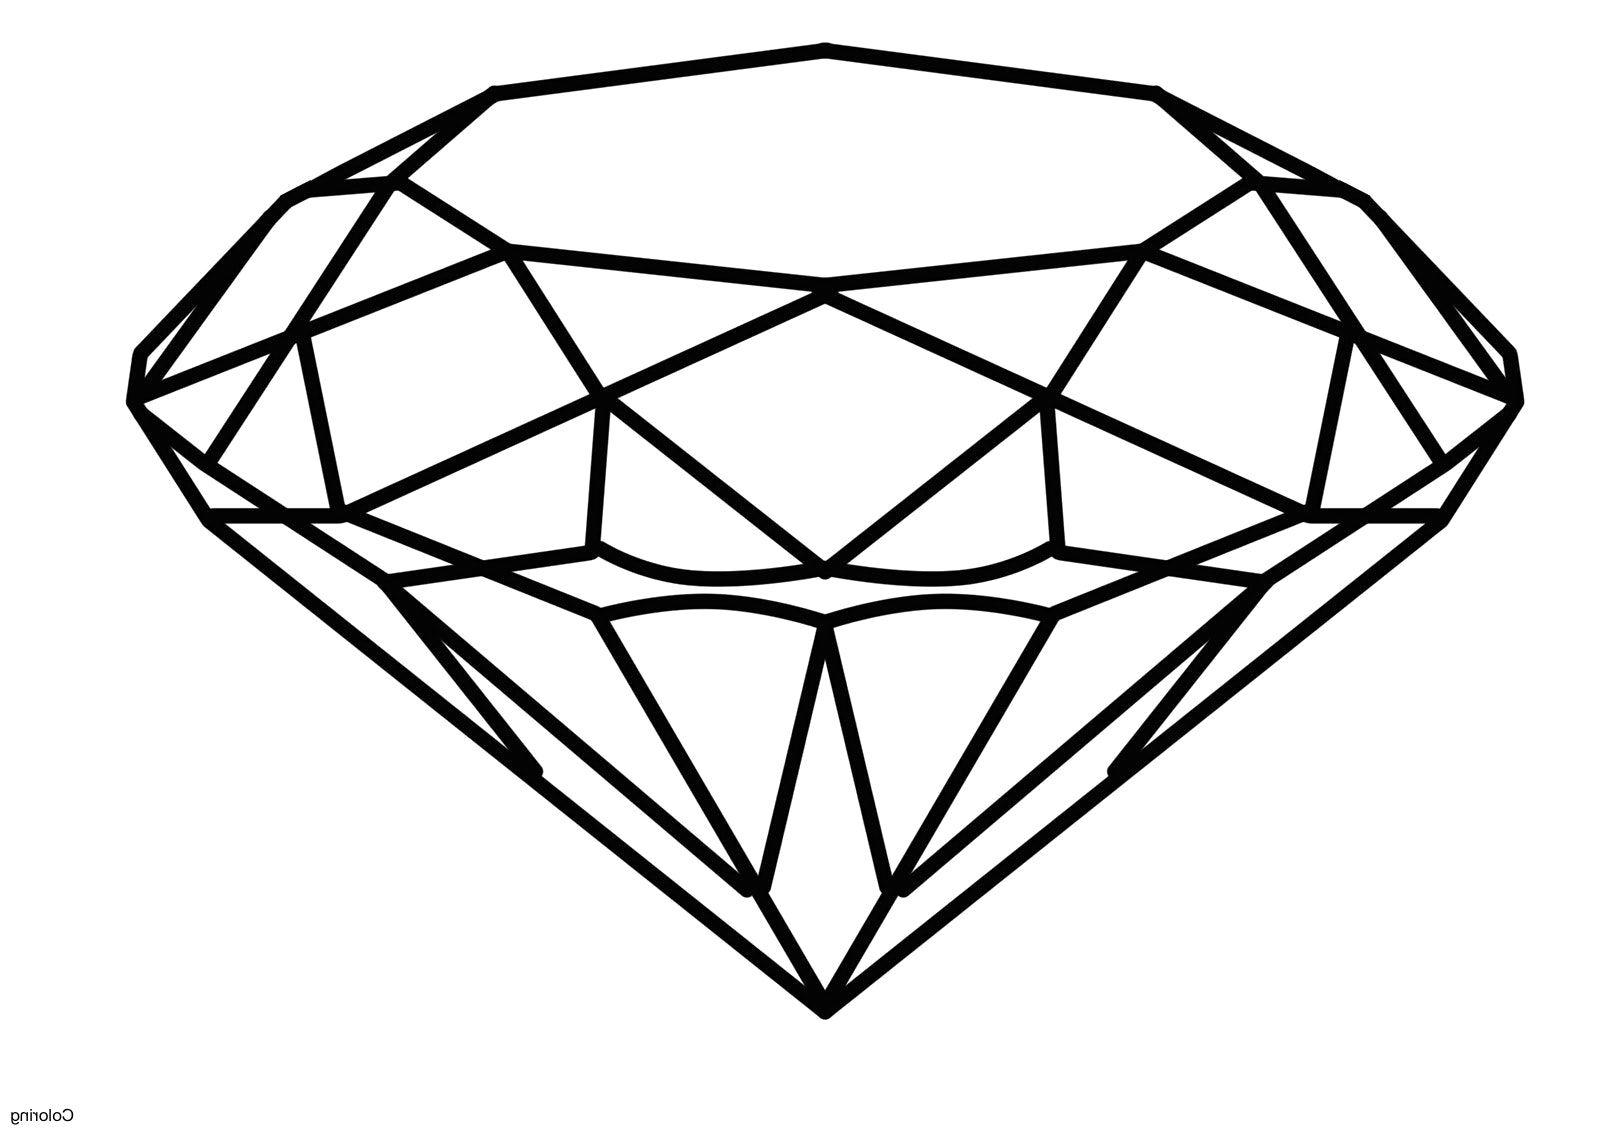 Diamond Coloring Pages Diamond Drawing Shape Coloring Pages Diamond Sketch